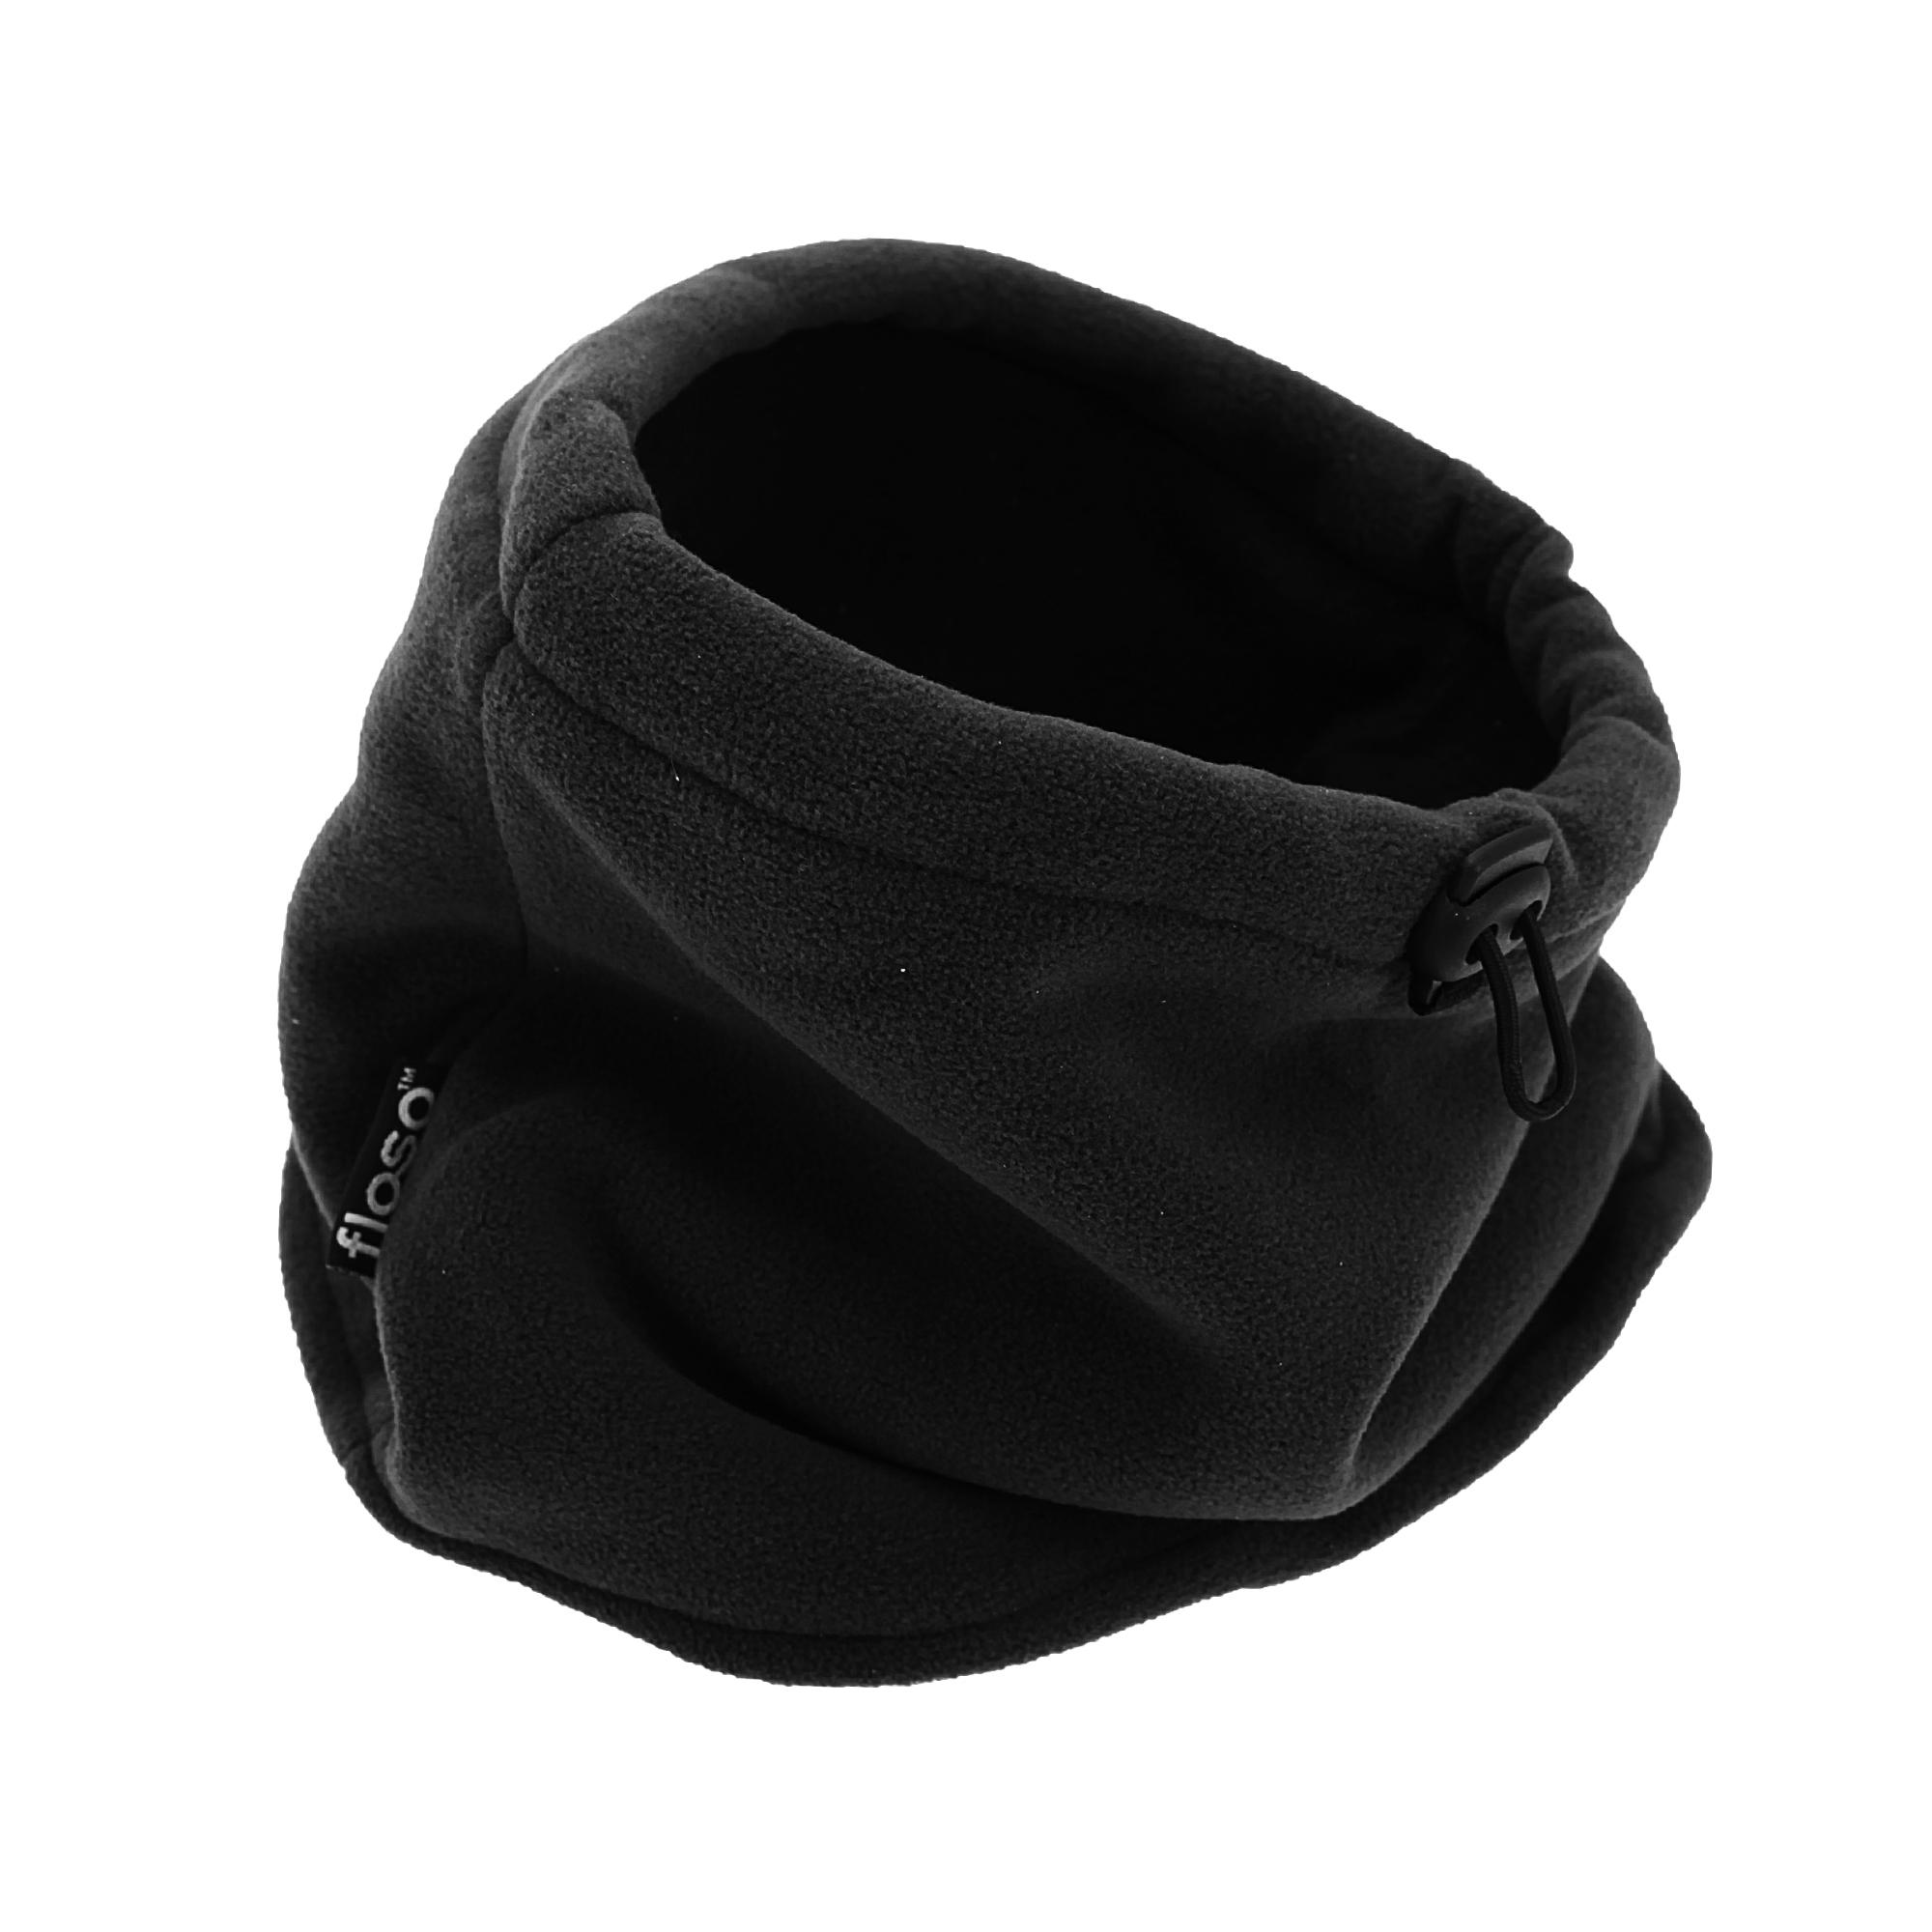 FLOSO Mens Fleece Thermal Winter Neck Snood (One Size) (Black)